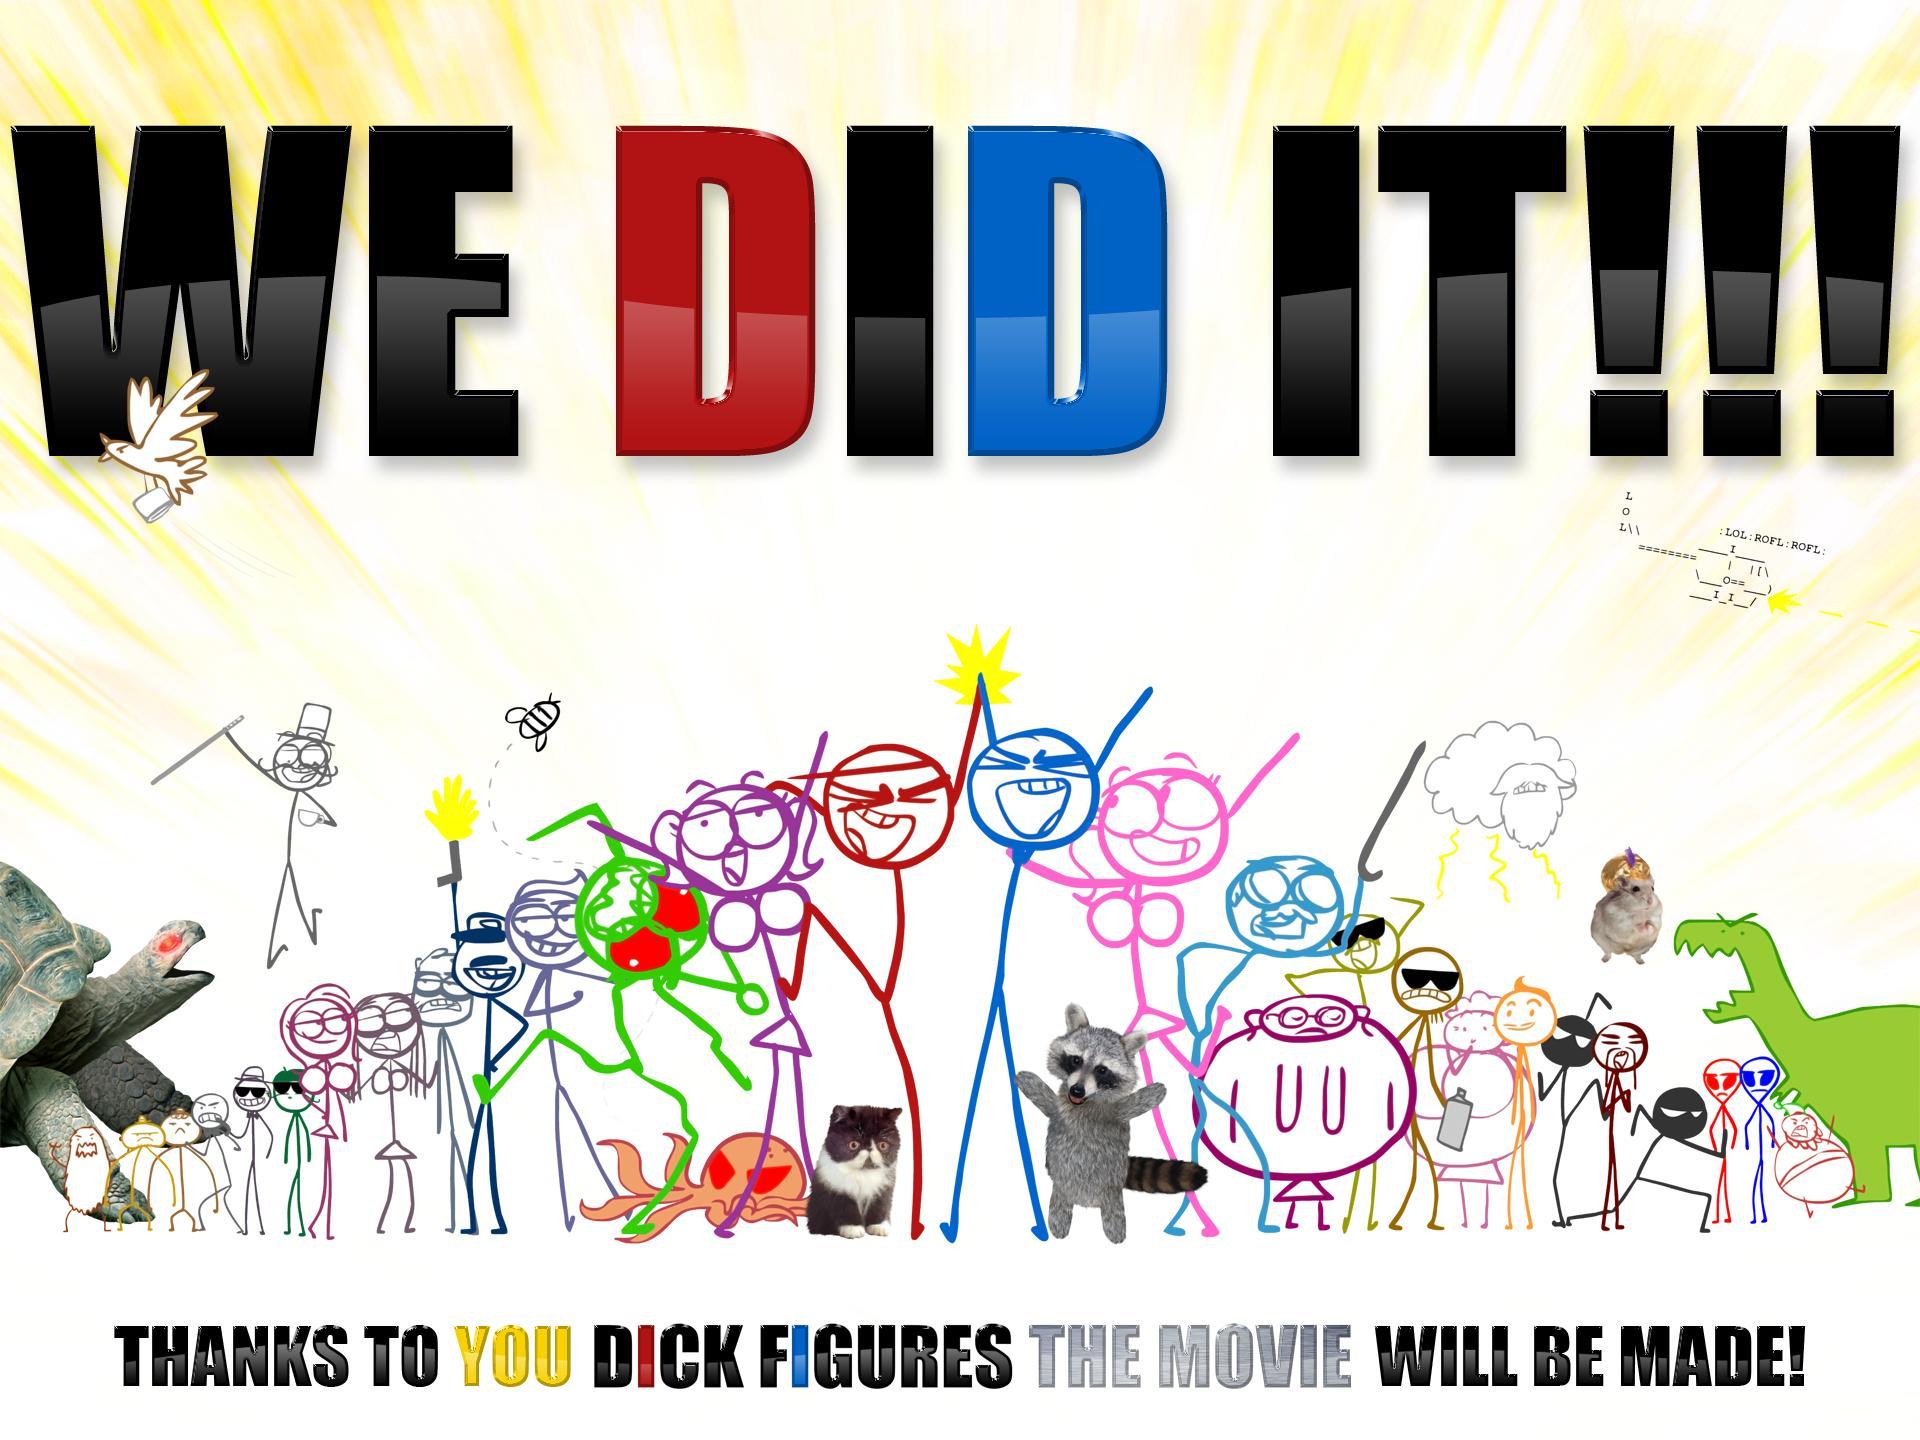 Dick Figures The Movie